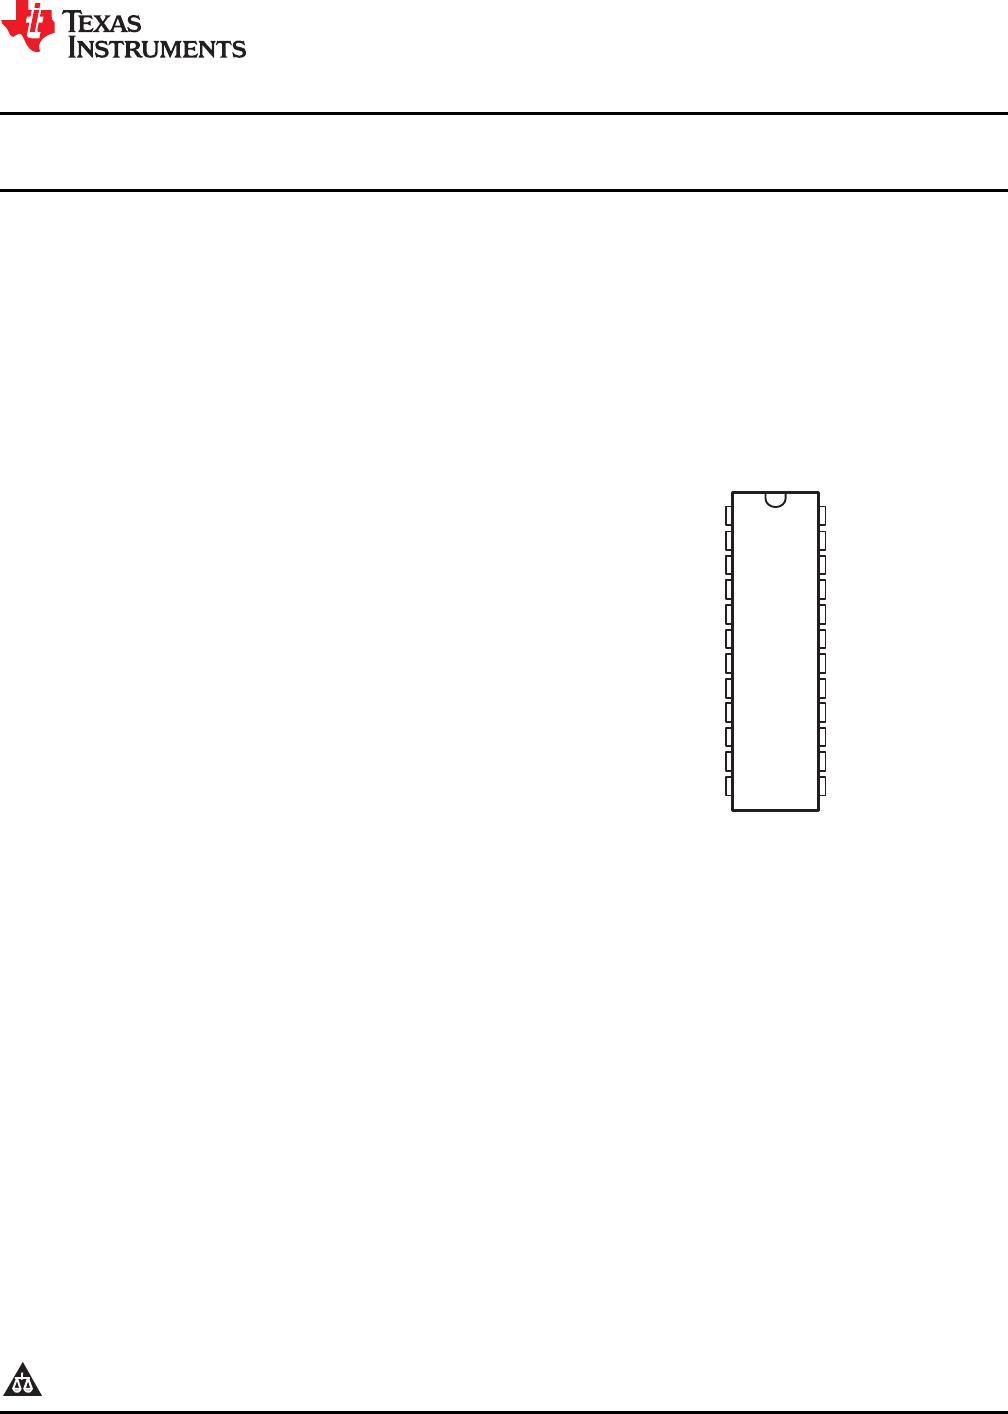 WWW_AV22PW_COM_pdf资料第514页 cdcvf2509pwr pdf下载及第1页内容在线浏览  clk av